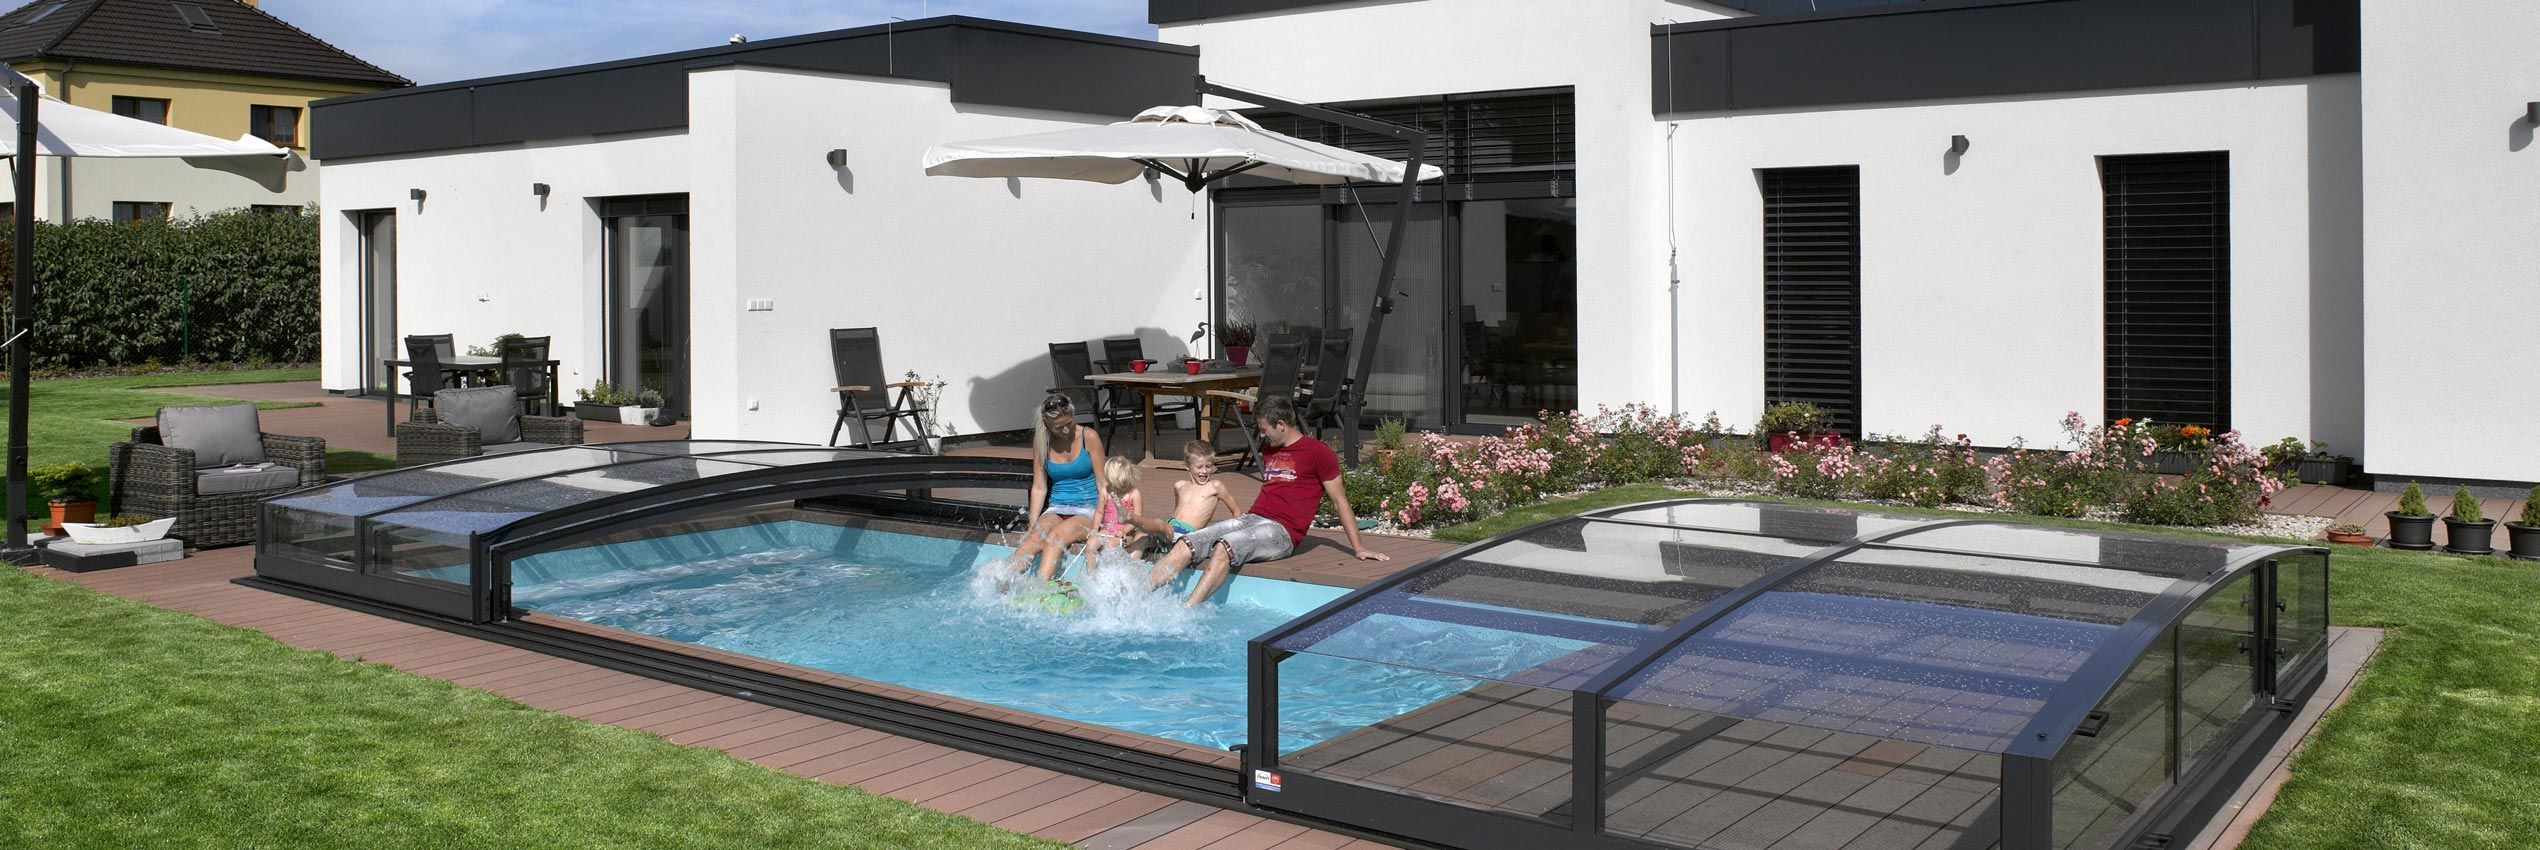 Abri de piscine viva for Abri patio club piscine